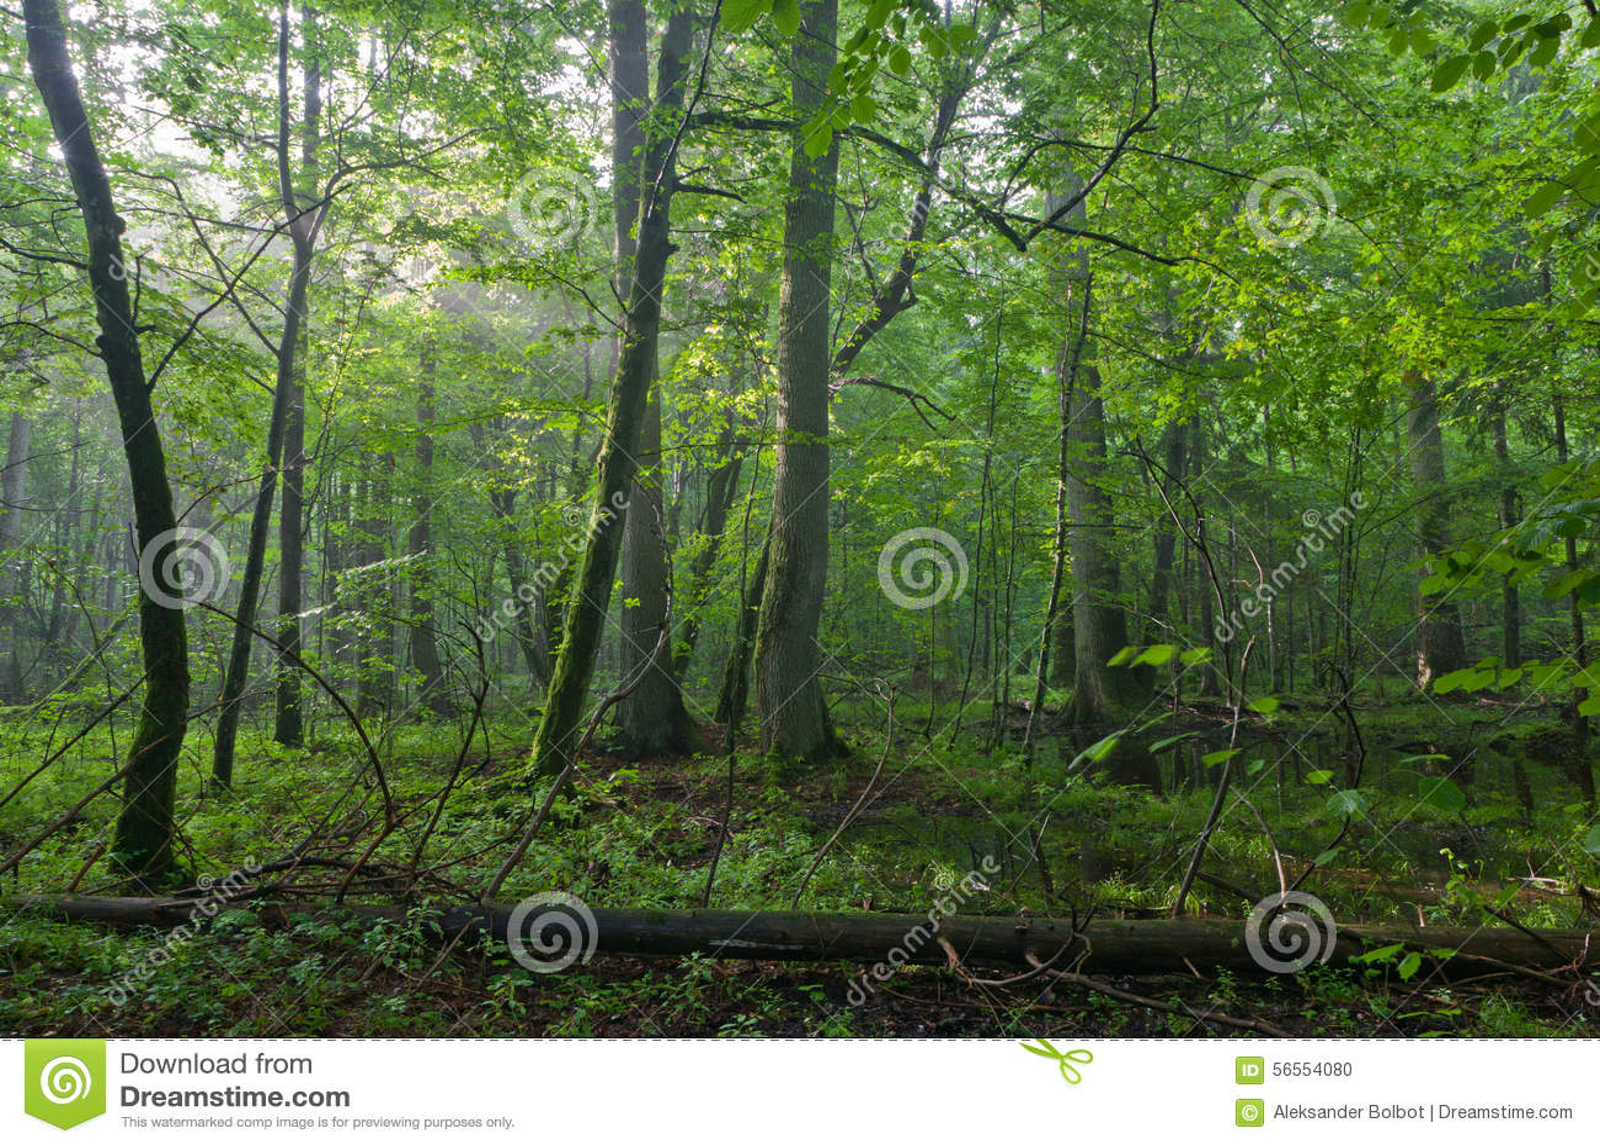 Download Παλαιά βαλανιδιά και Hornbeams φυσικού στα τέλη του καλοκαιριού Στοκ Εικόνες - εικόνα από οικοσύστημα, τοπίο: 56554080